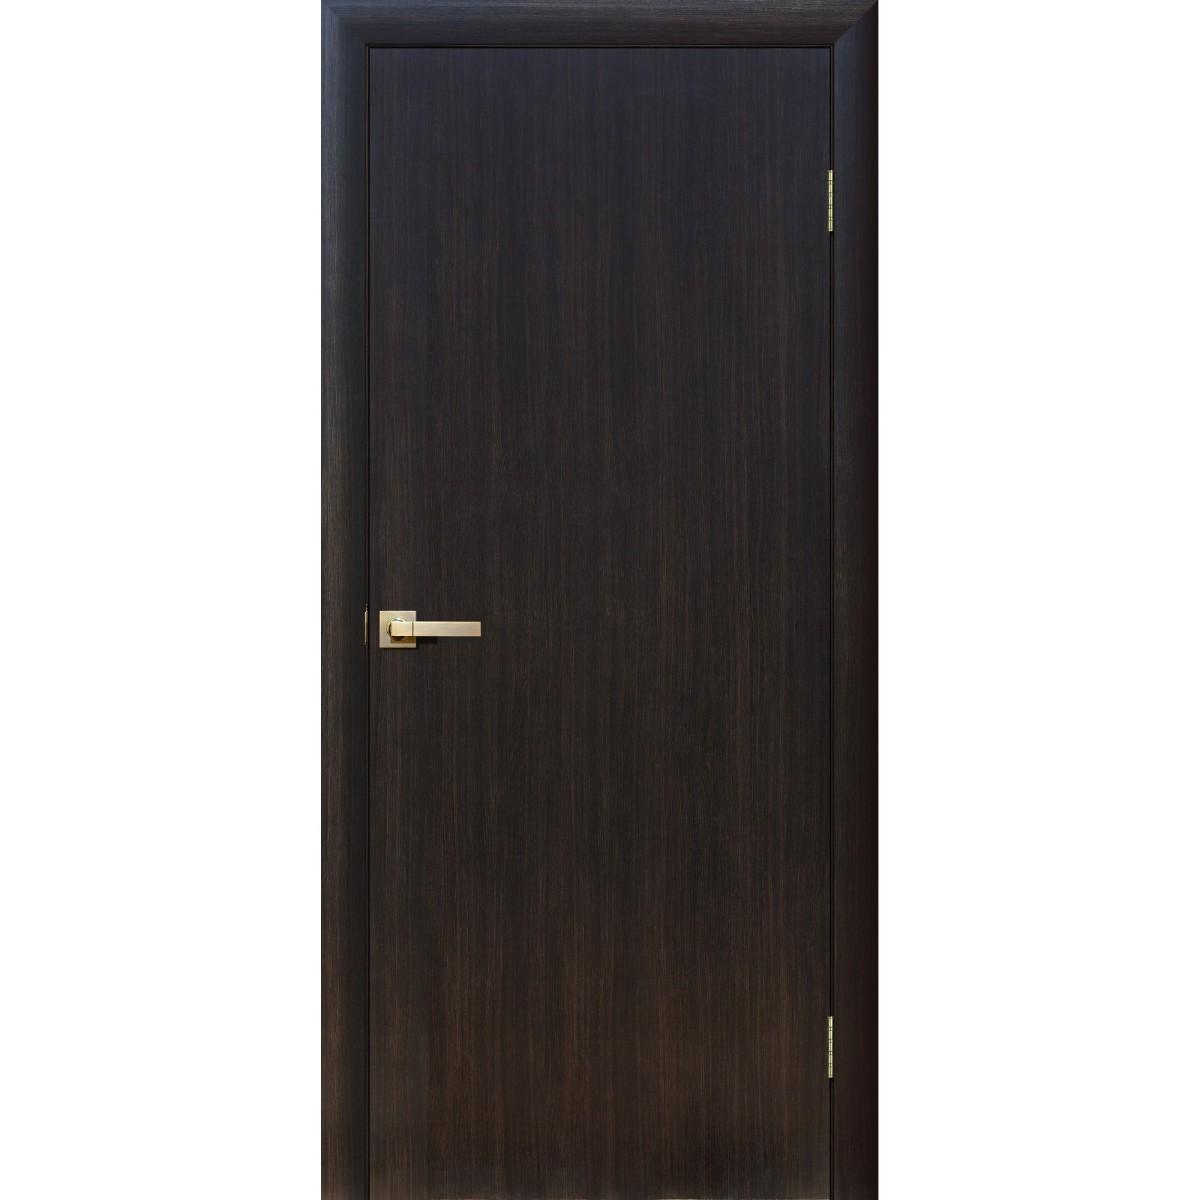 Дверь межкомнатная глухая Стандарт 50x200 см ламинация цвет дуб феррара